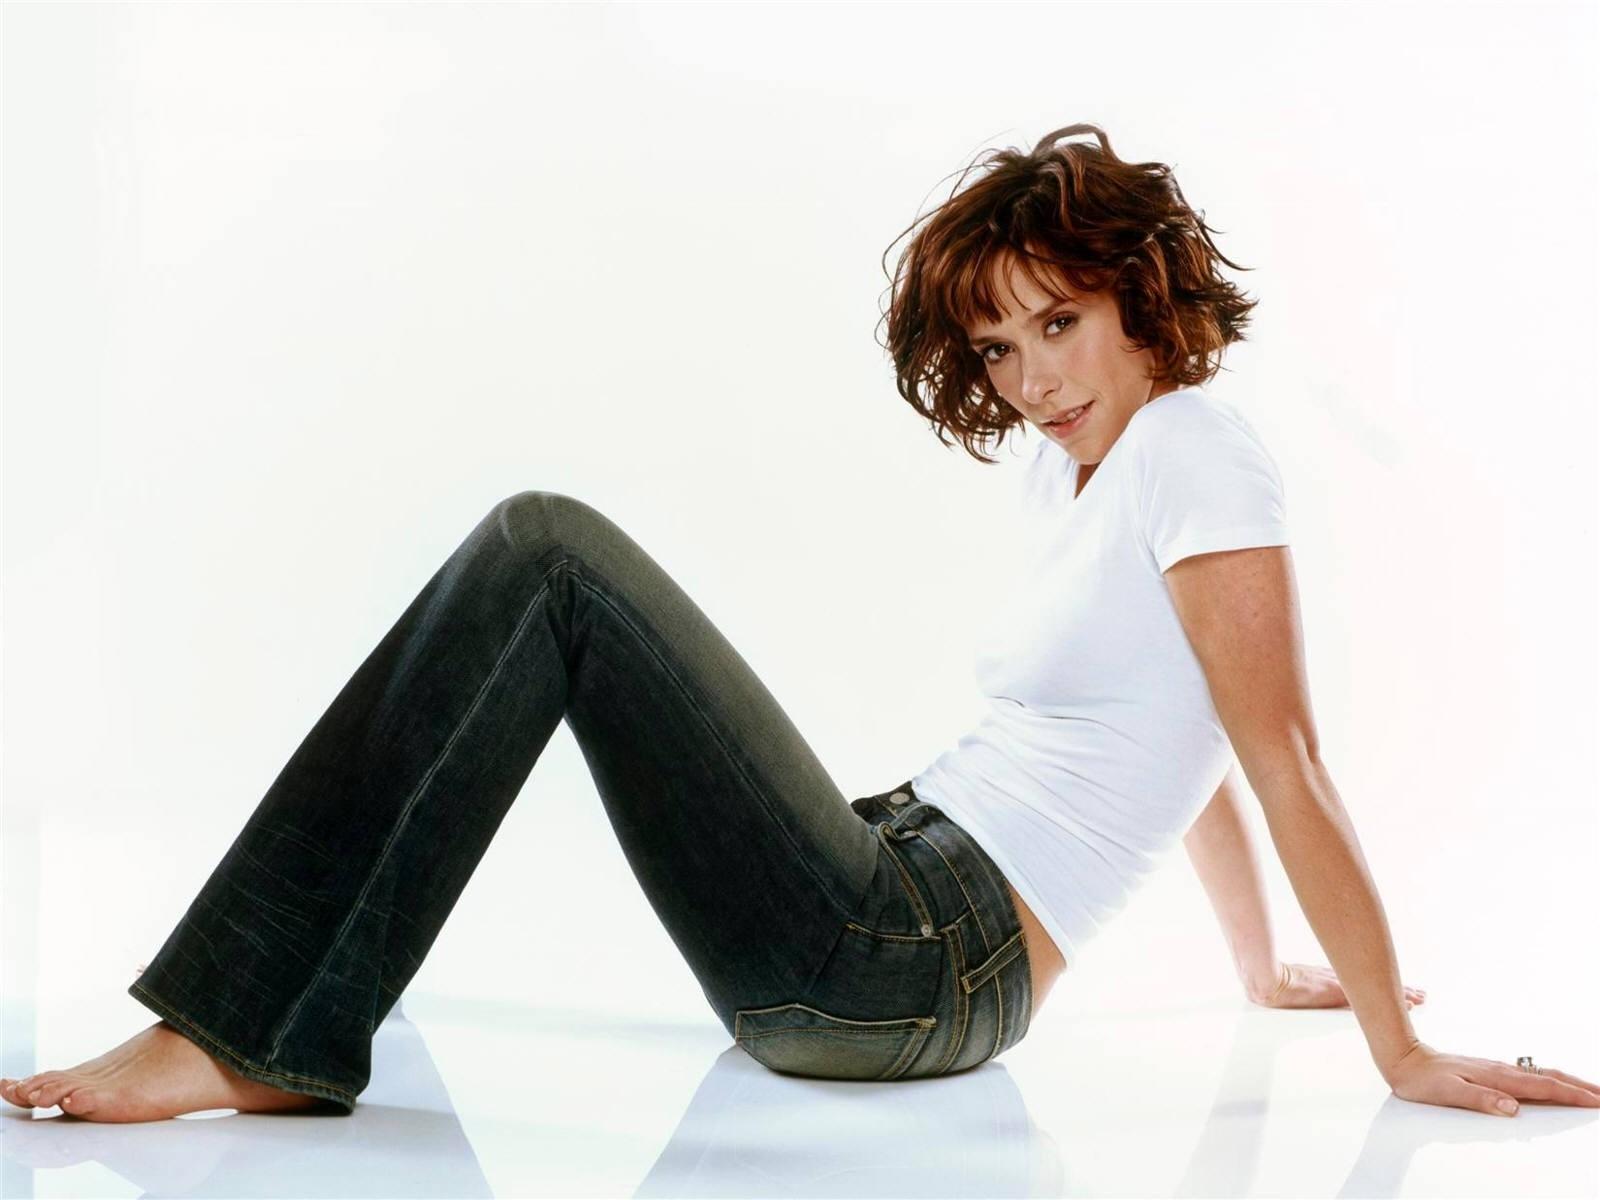 Wallpaper di Jennifer Love Hewitt in jeans e t-shirt